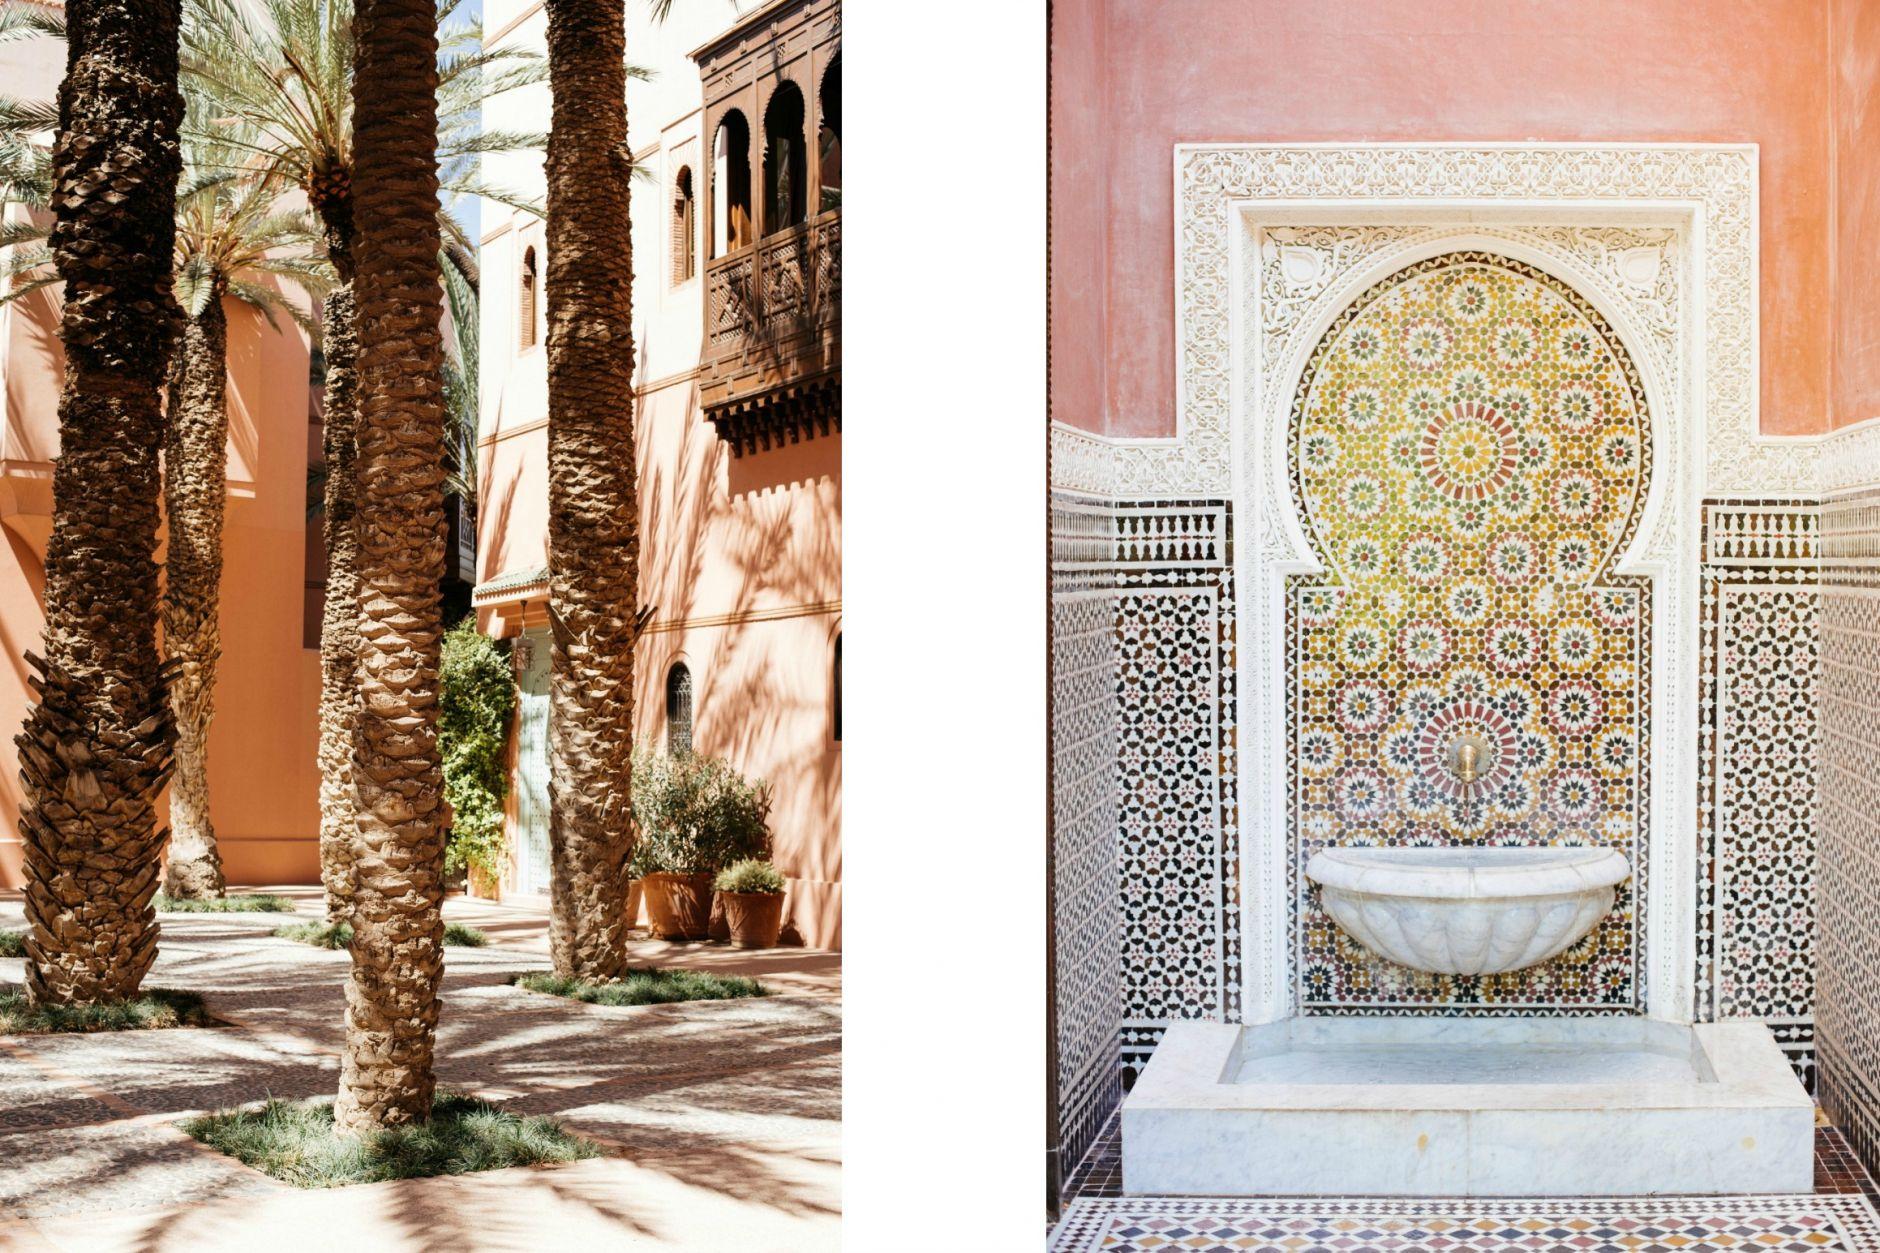 royal-mansour-hotel-luxury-marrakesch-marrakesh-morocco-edisa-shahini-disicouture-blog-duo-15